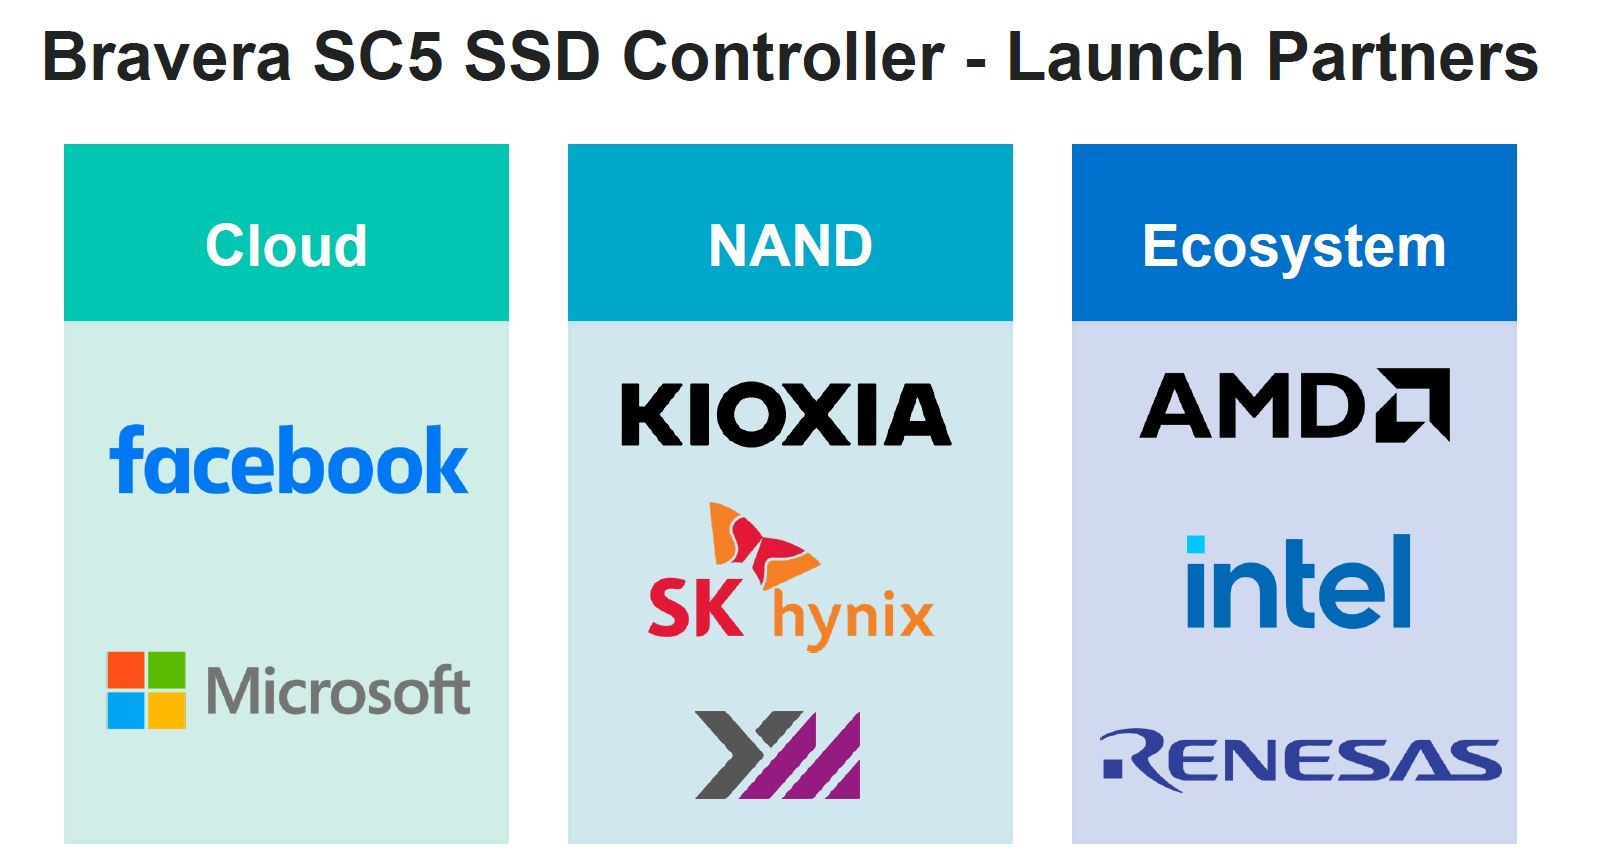 Marvell Bravera SC5 Launch Partners